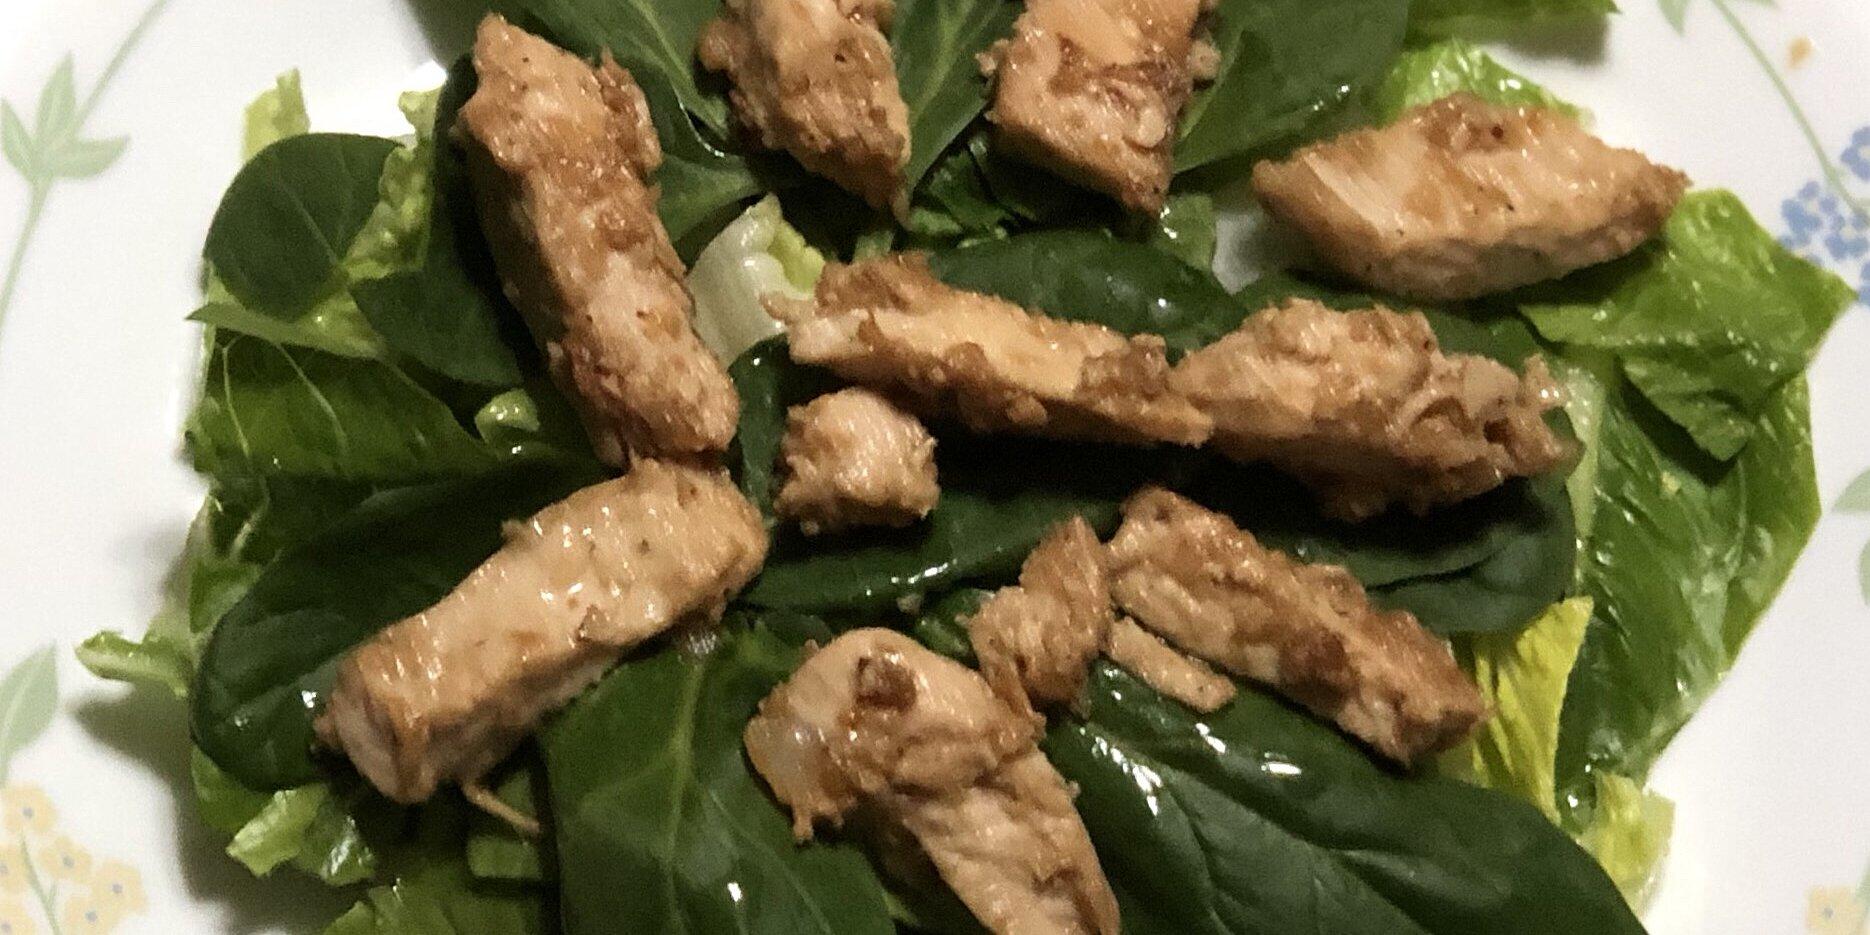 lime garlic chicken and spinach salad recipe